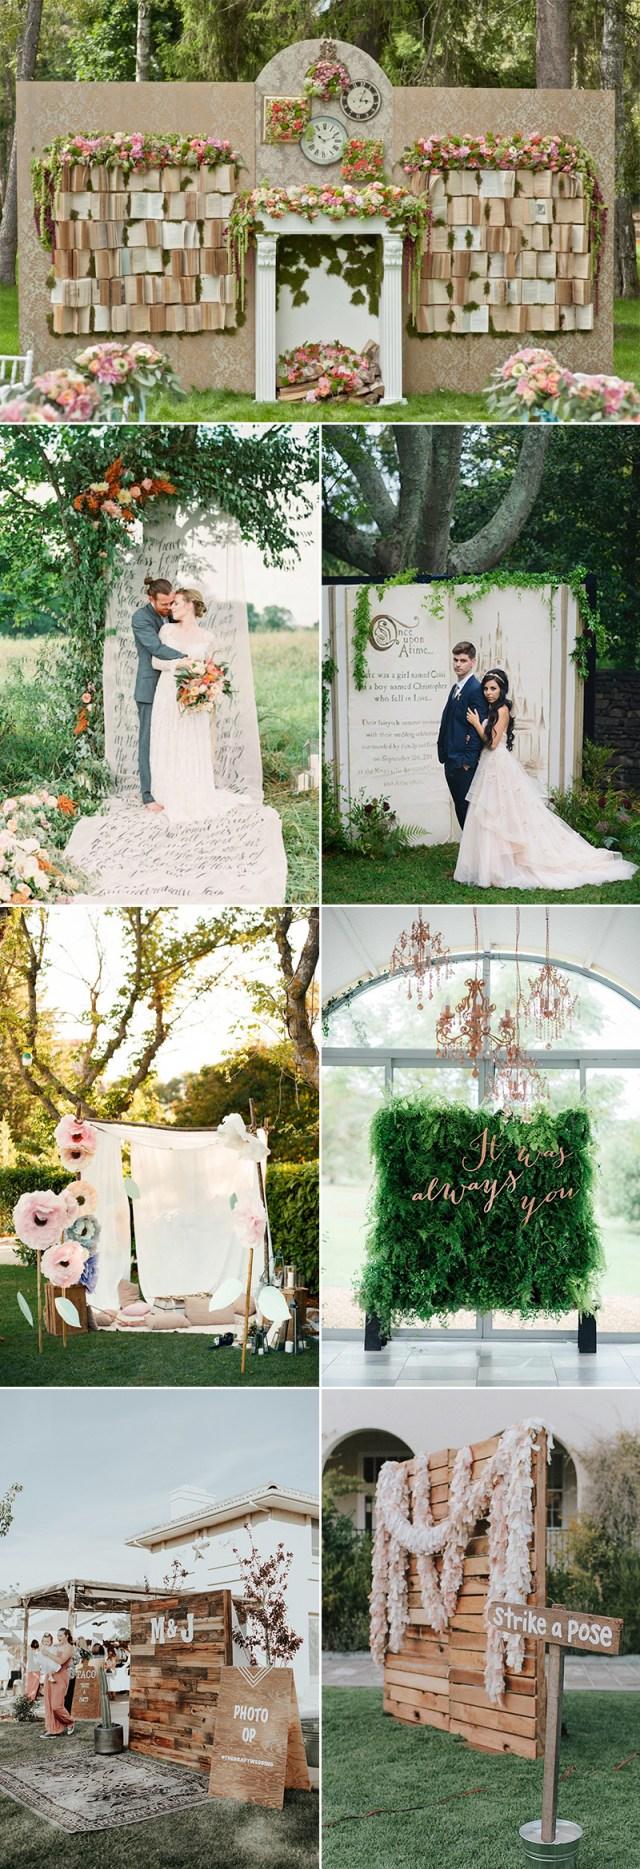 Photobooth Ideas Wedding 5 Wedding Photo Booth Trends To Follow For 2019 Praise Wedding